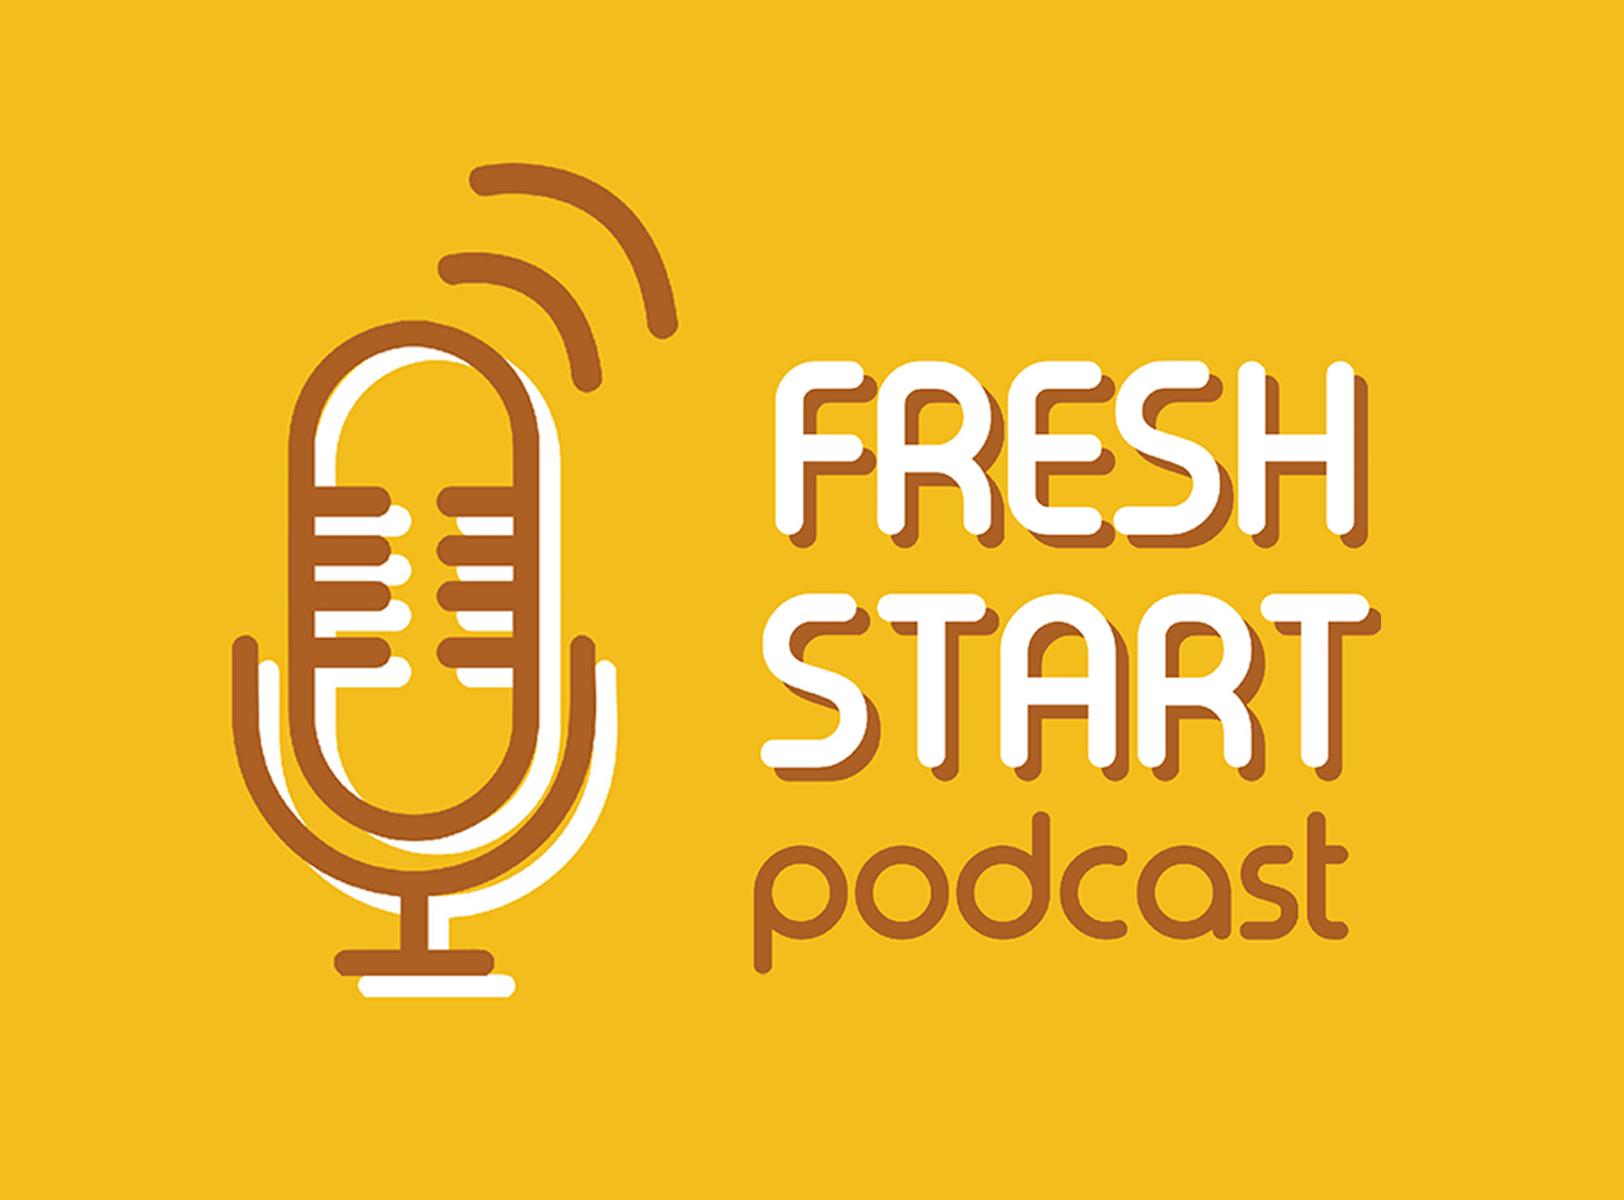 Fresh Start: Podcast News (2/7/2019 Thu.)